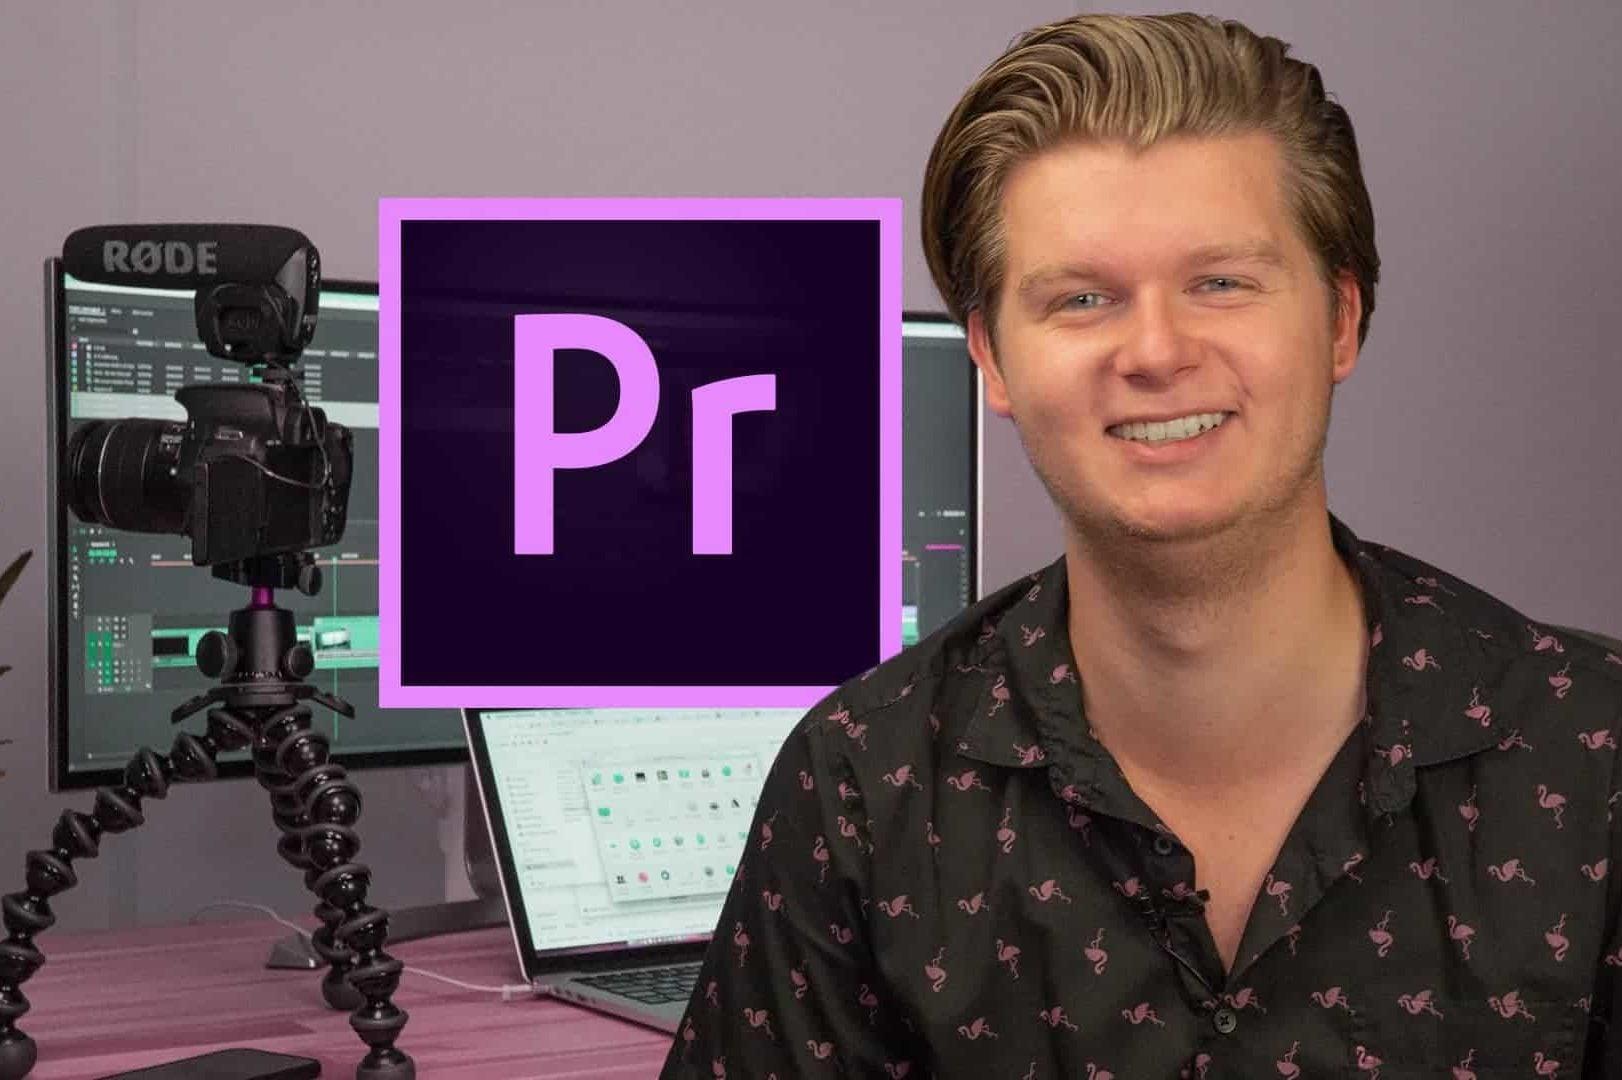 Leer alles over video-editing met Premiere Pro